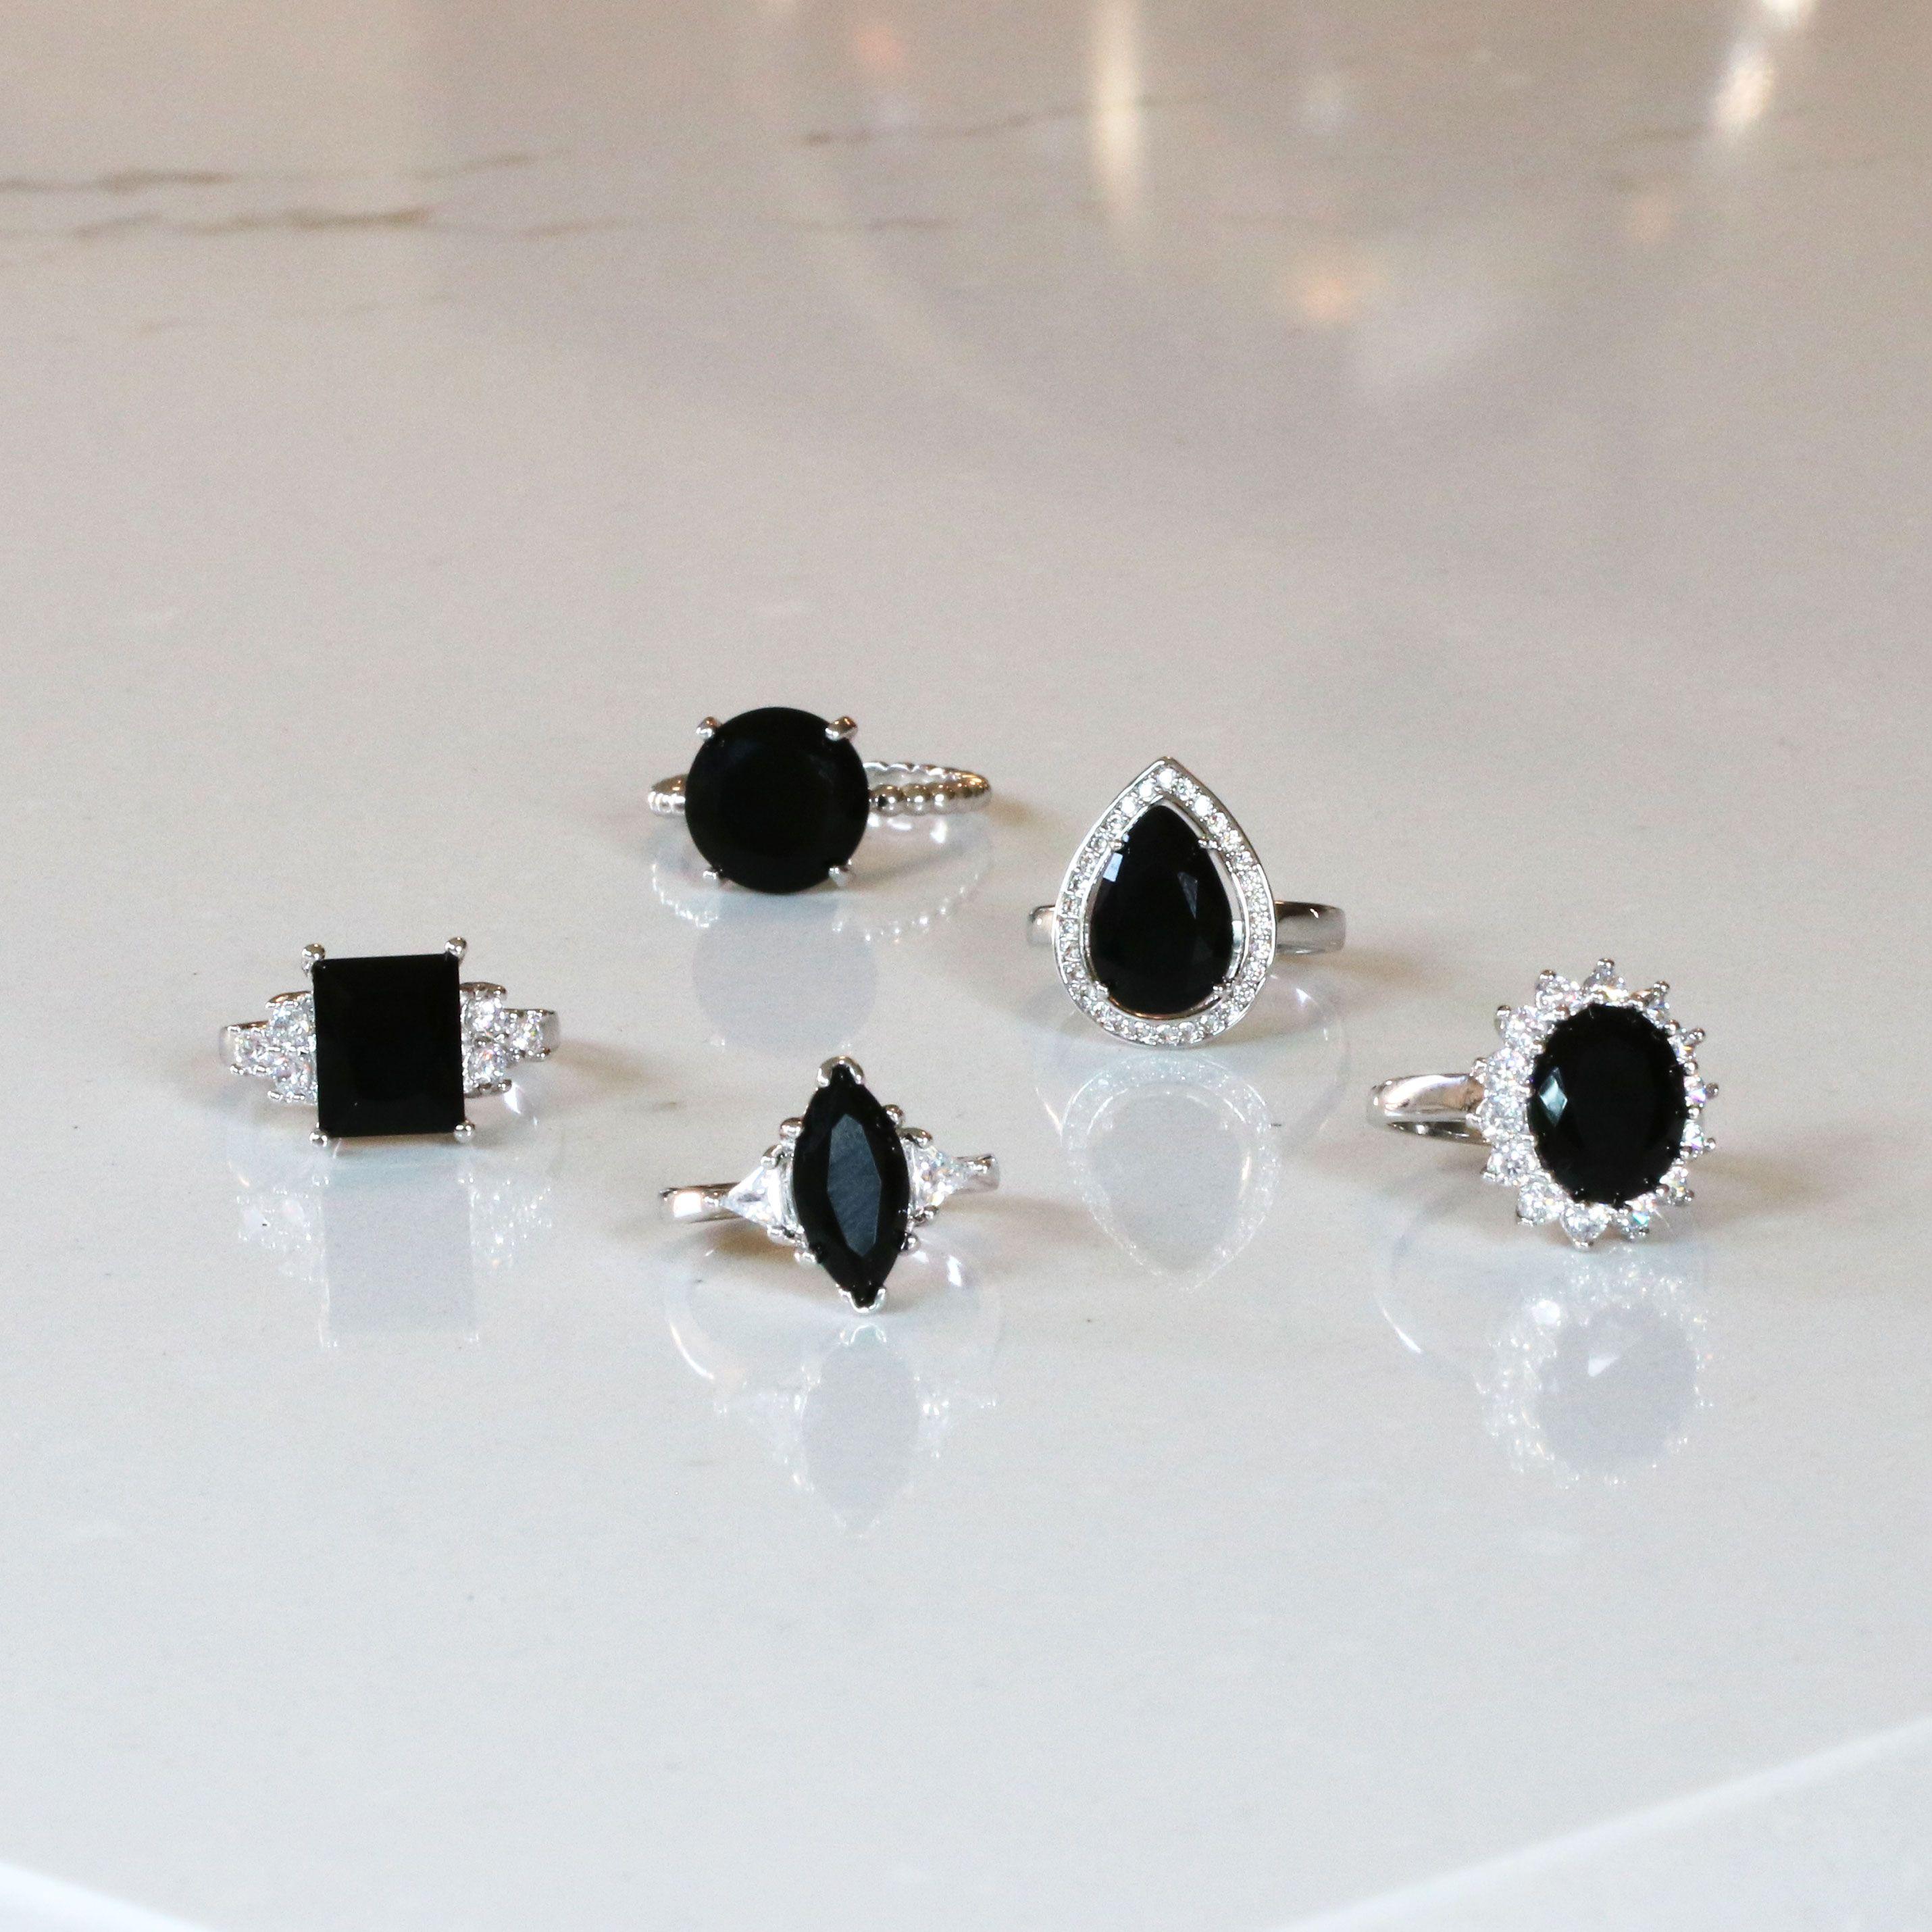 Dark Magic Charcoal Bath Bombs With Rings Black Bath Bomb Black Cz